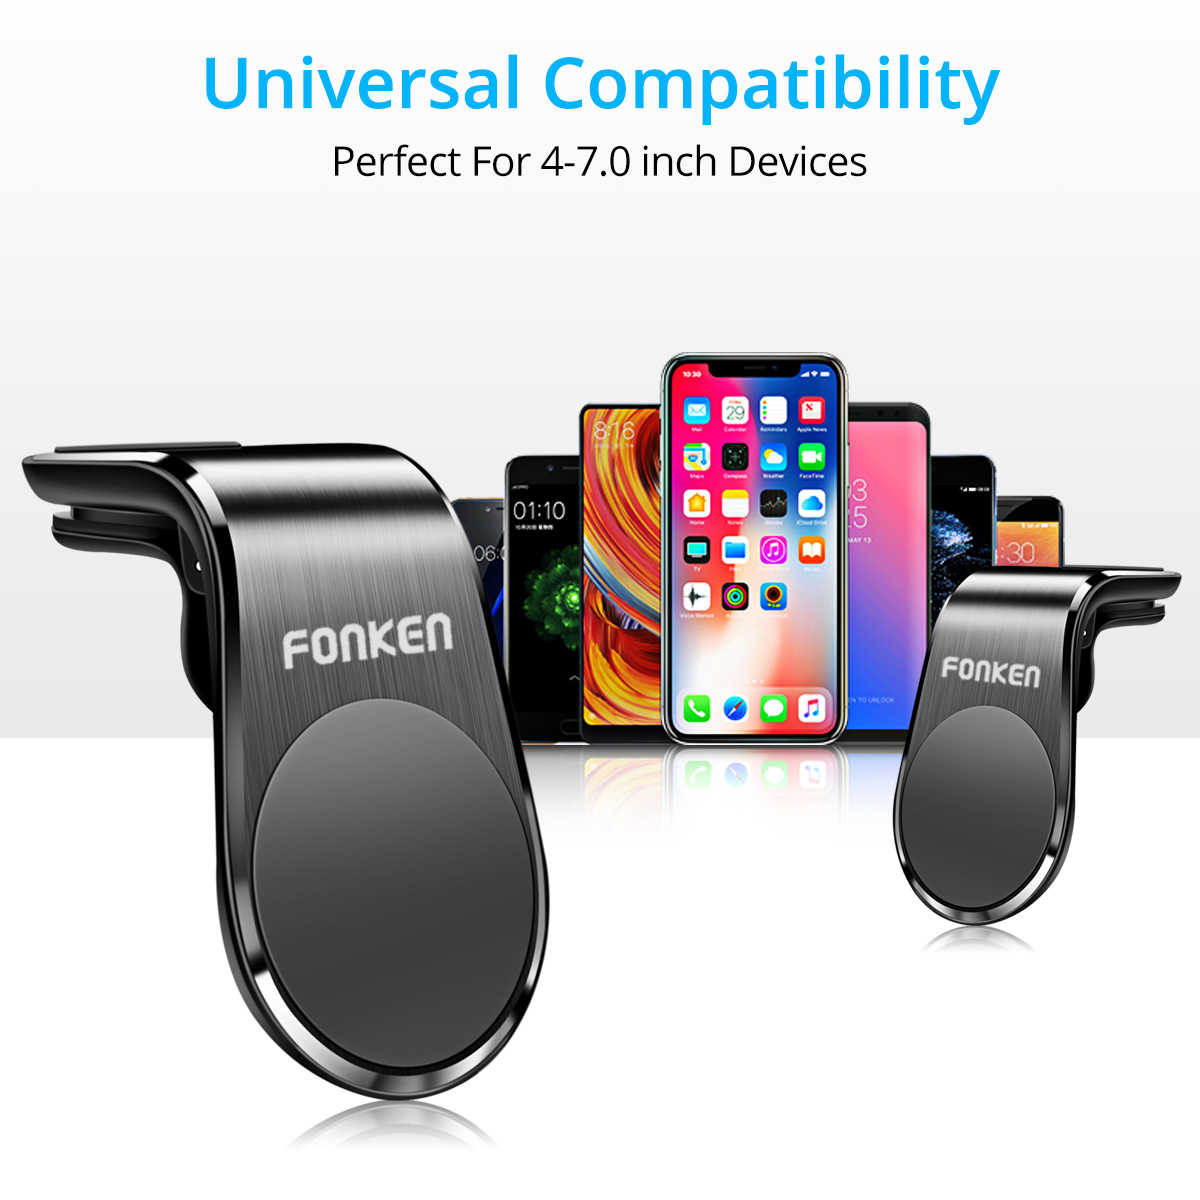 Fonken Magnetik Mobil Ponsel Holder Mount Stand Universal Air Vent Klip Mount untuk iPhone 11 Pro Max Huawei Xiaomi Di gps Navigasi